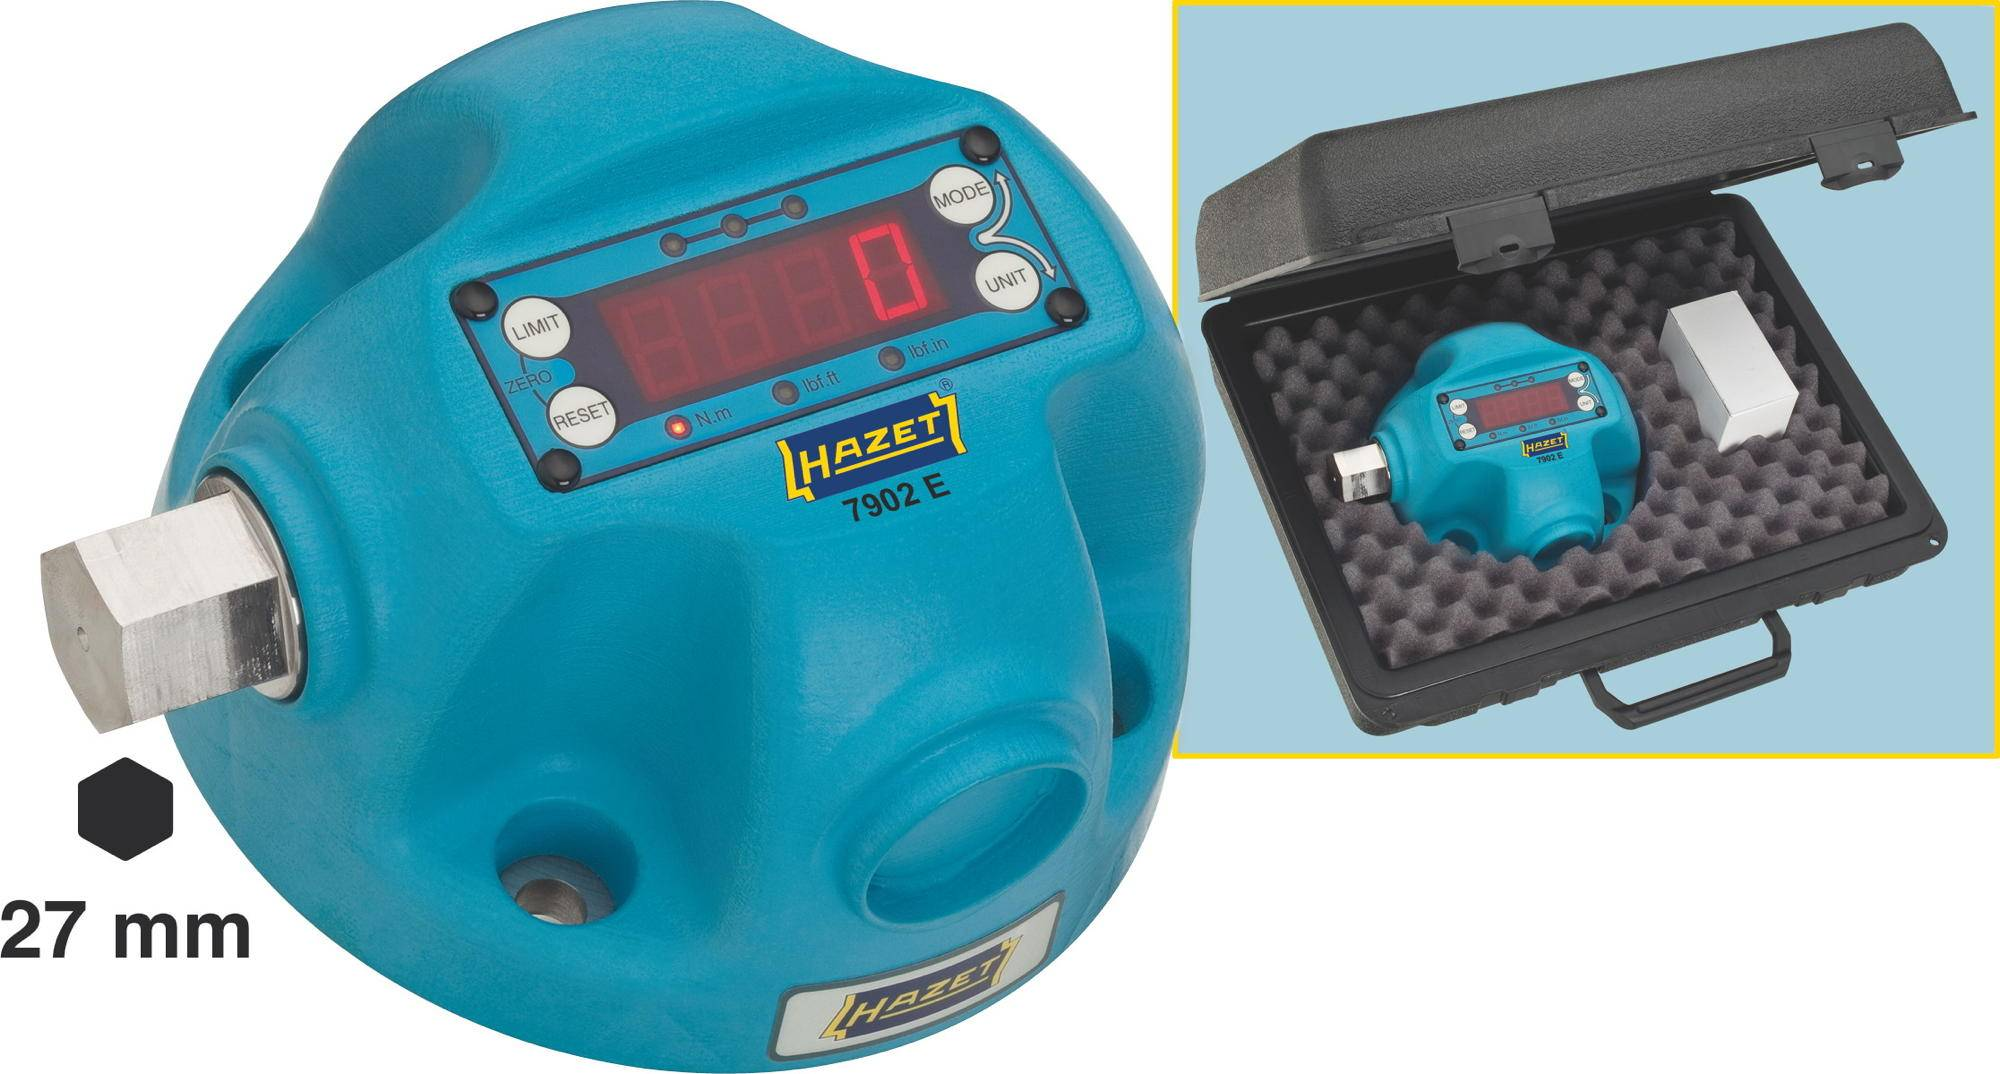 Digitální tester točivého momentu Hazet, 7902E, 100 - 1000 Nm